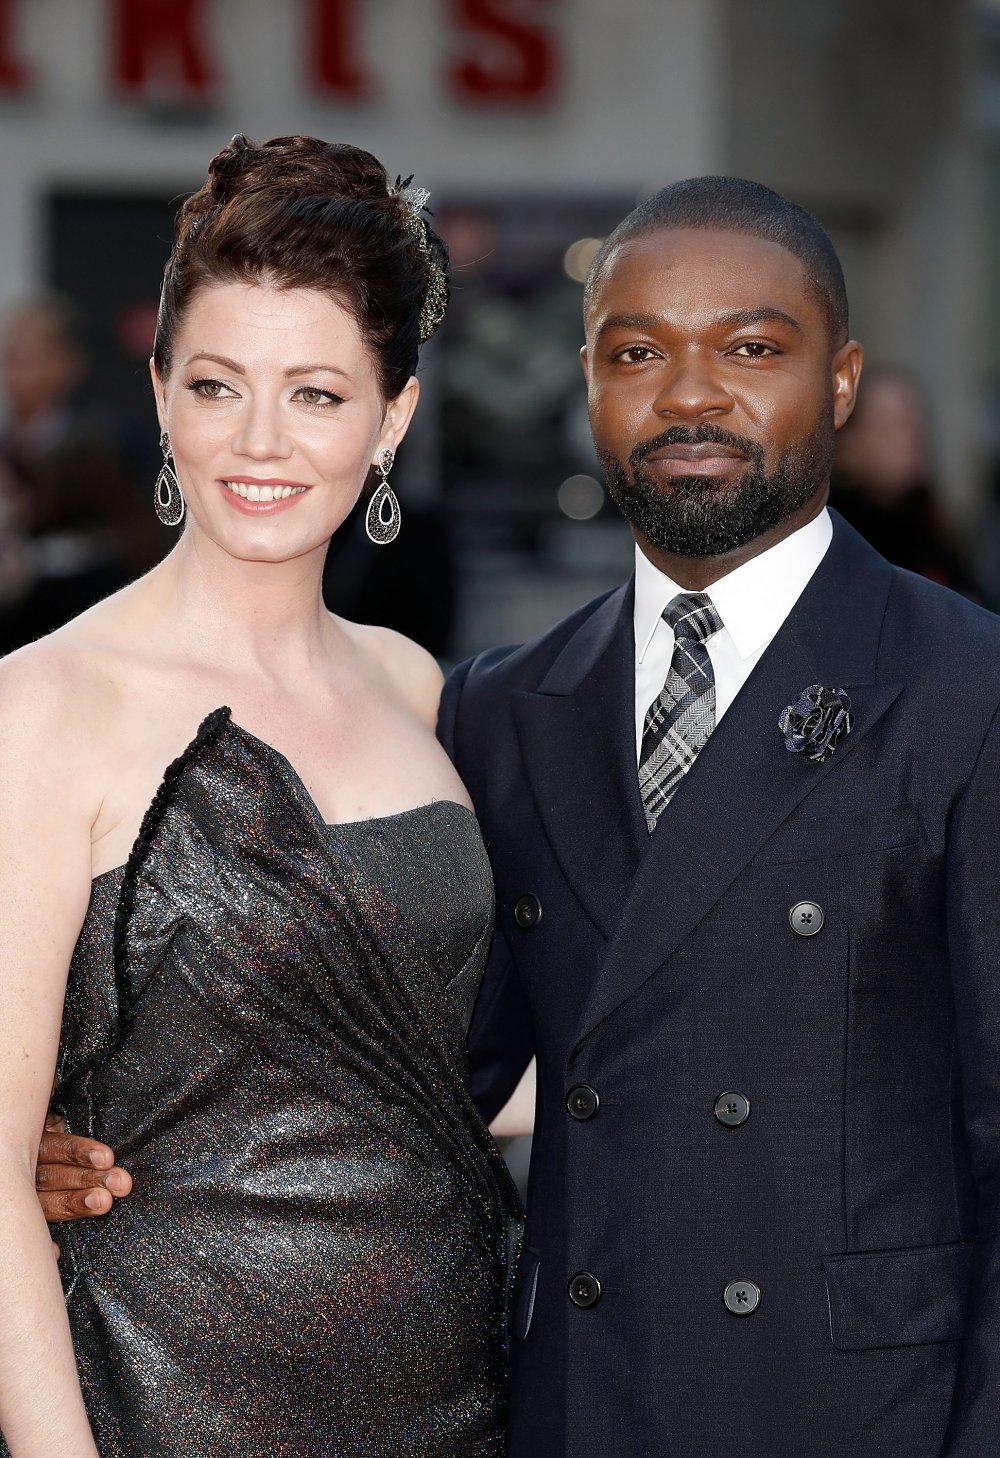 Jessica Oyelowo and David Oyelowo attend the A United Kingdom Opening Night Gala screening during the 60th BFI London Film Festival